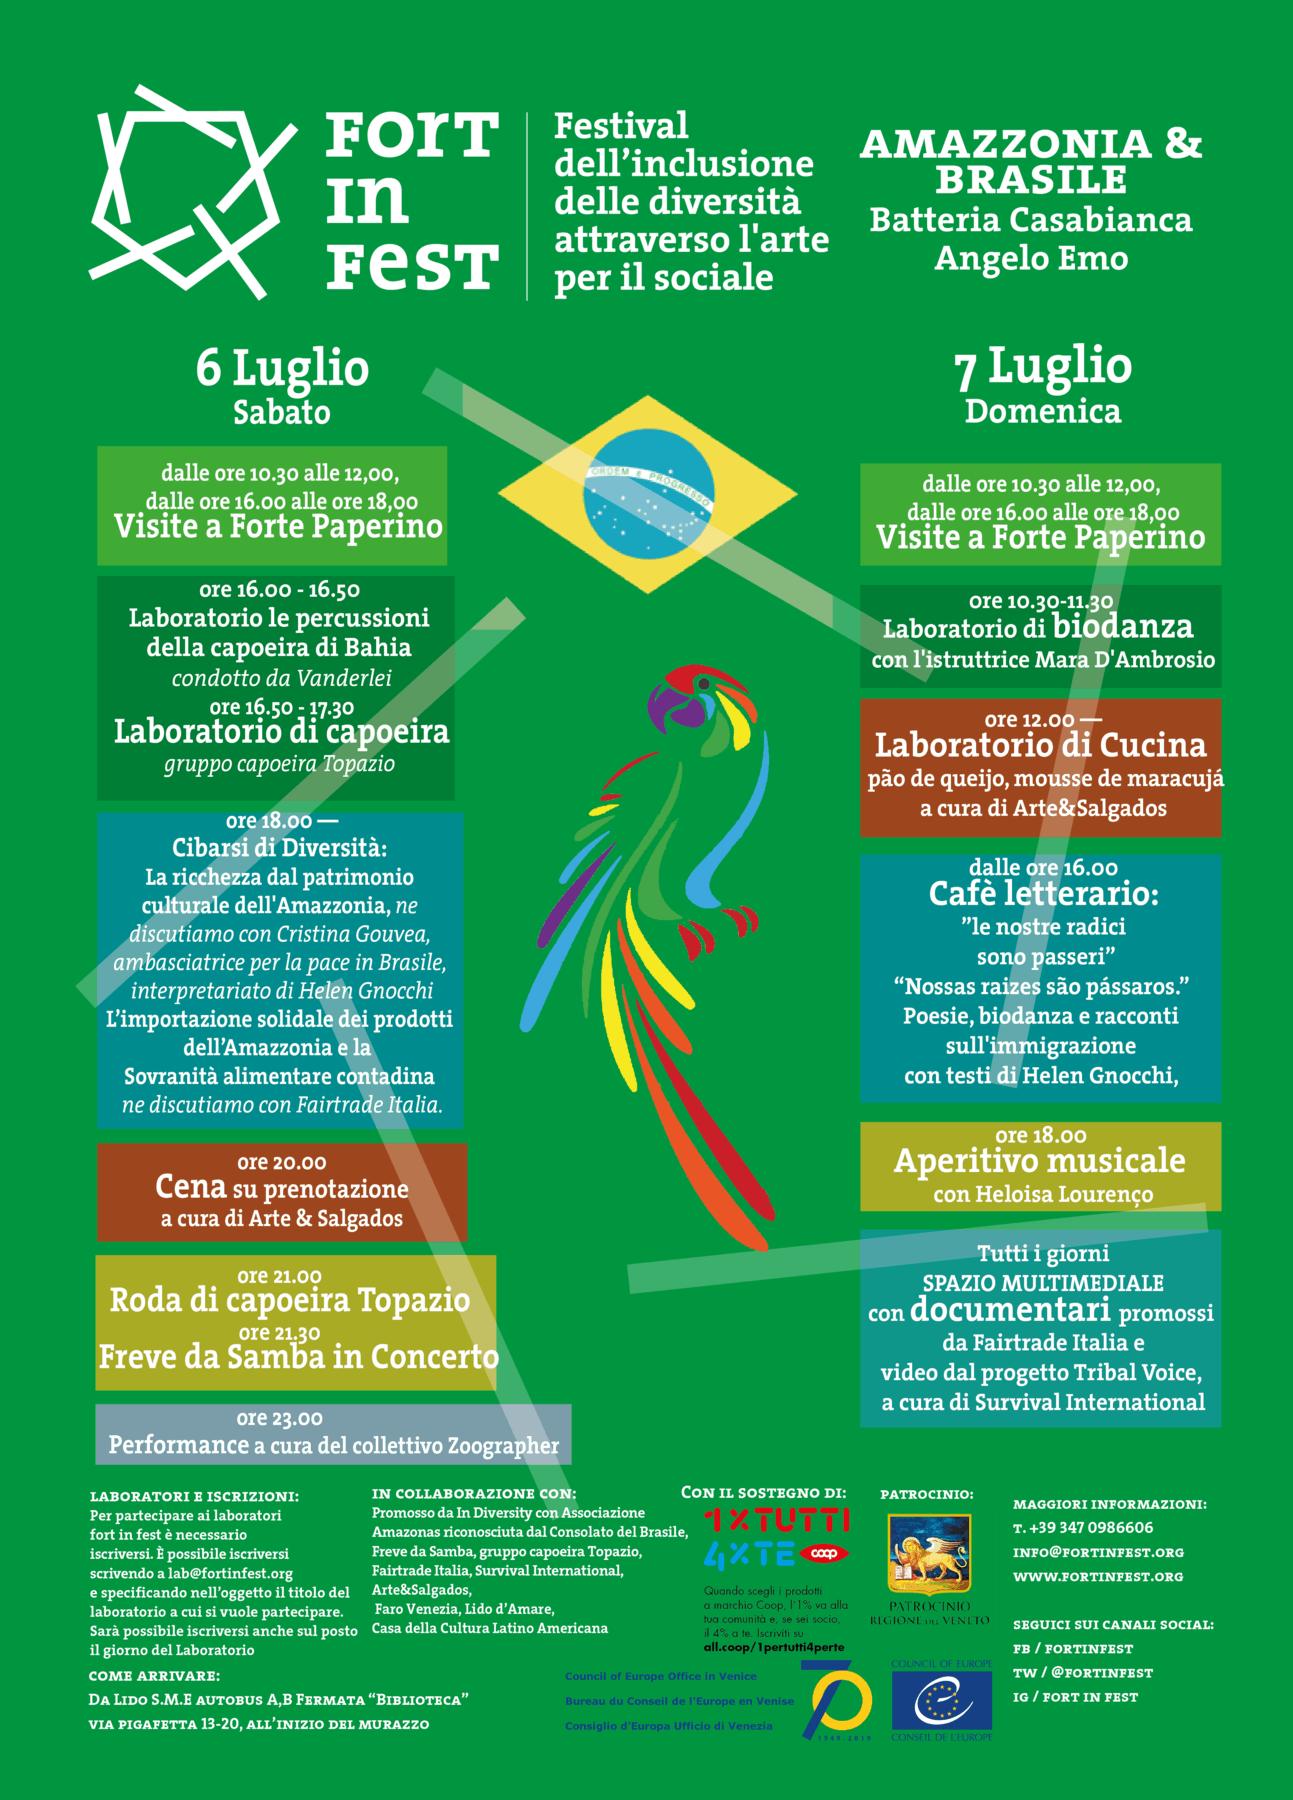 FORT in FEST: Amazonia & Brazil